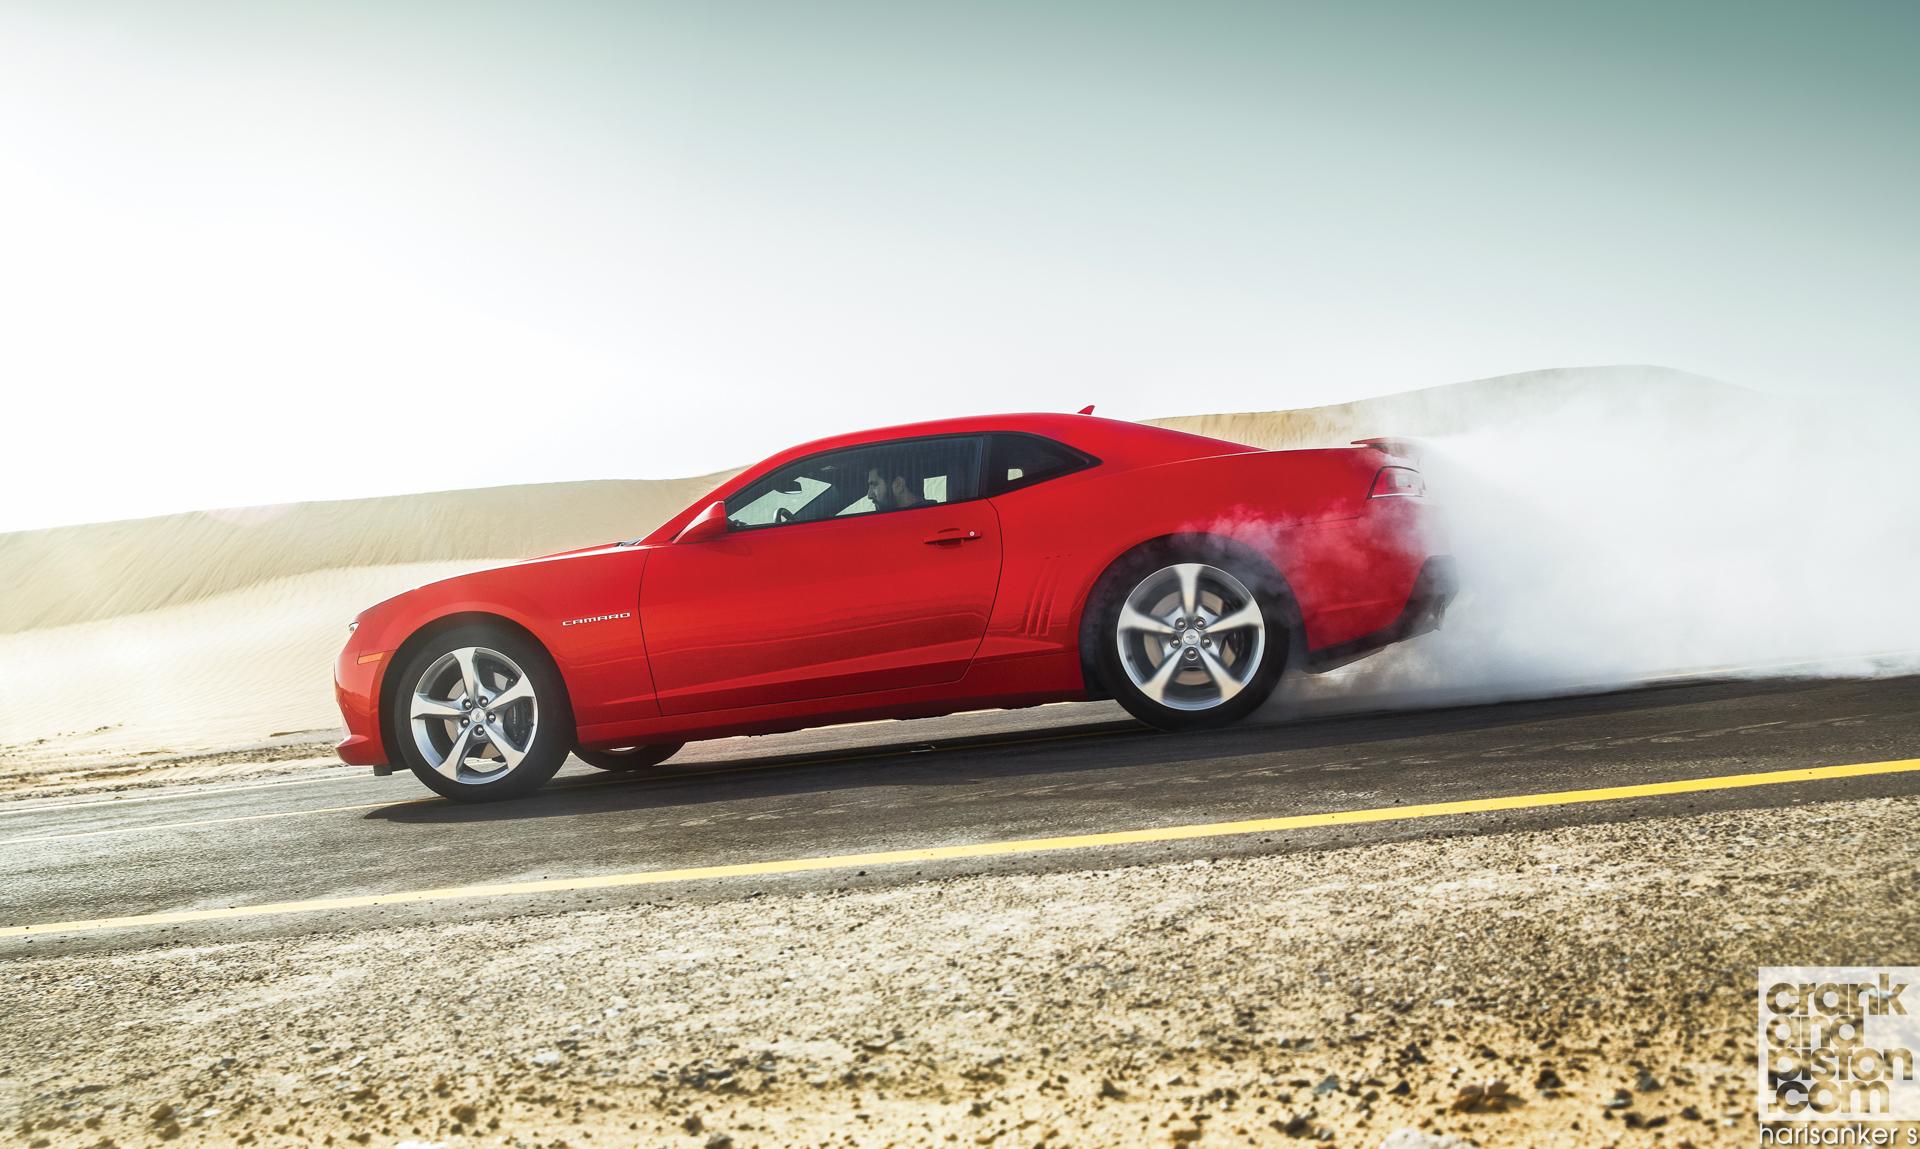 Ford-Mustang-v-Dodge-Challenger-R-T-v-Chevrolet-Camaro-SS-Wallpapers-11